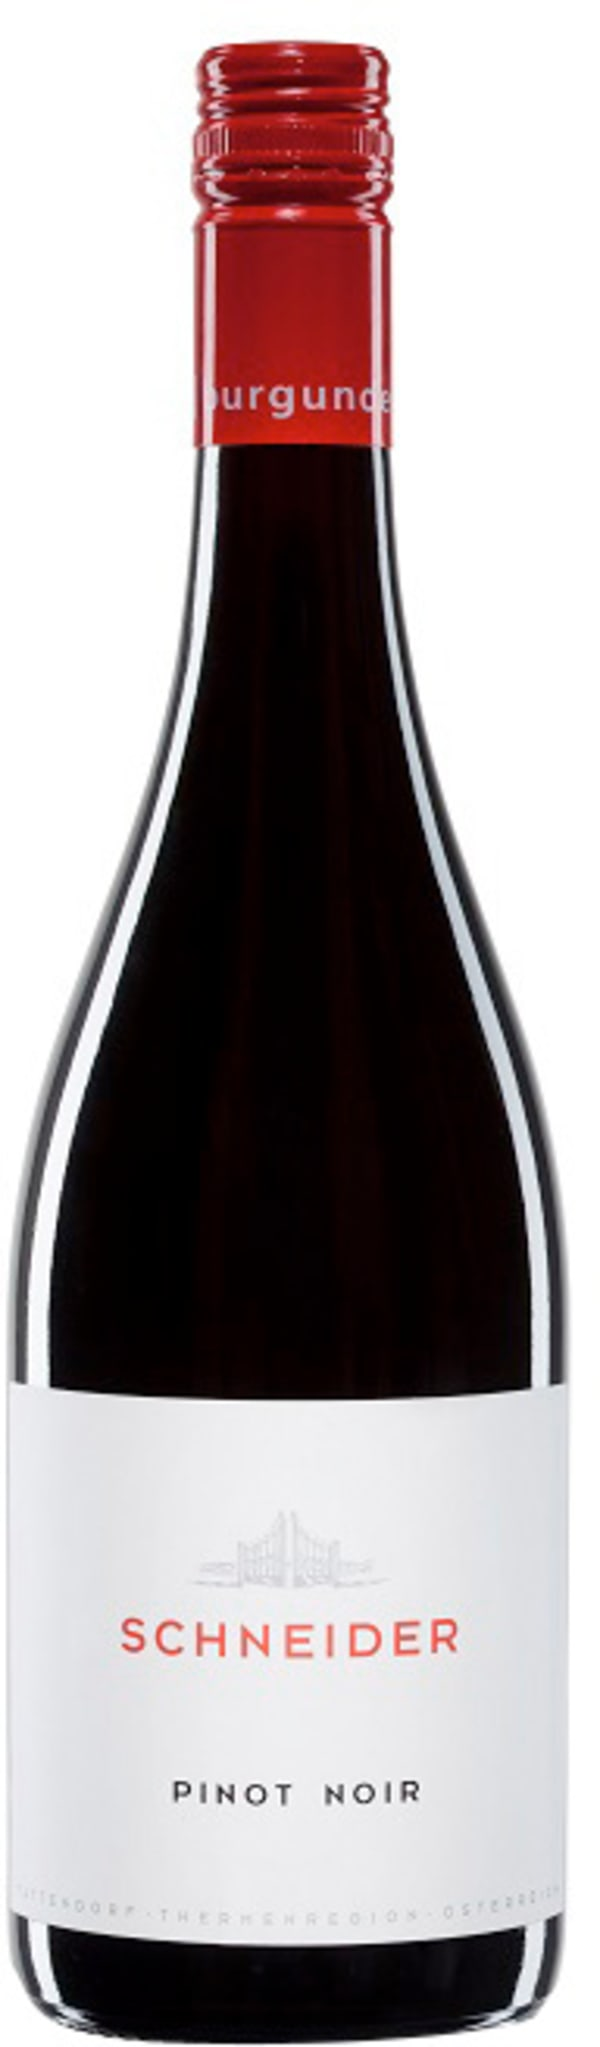 Schneider Tattendorf Pinot Noir 2015